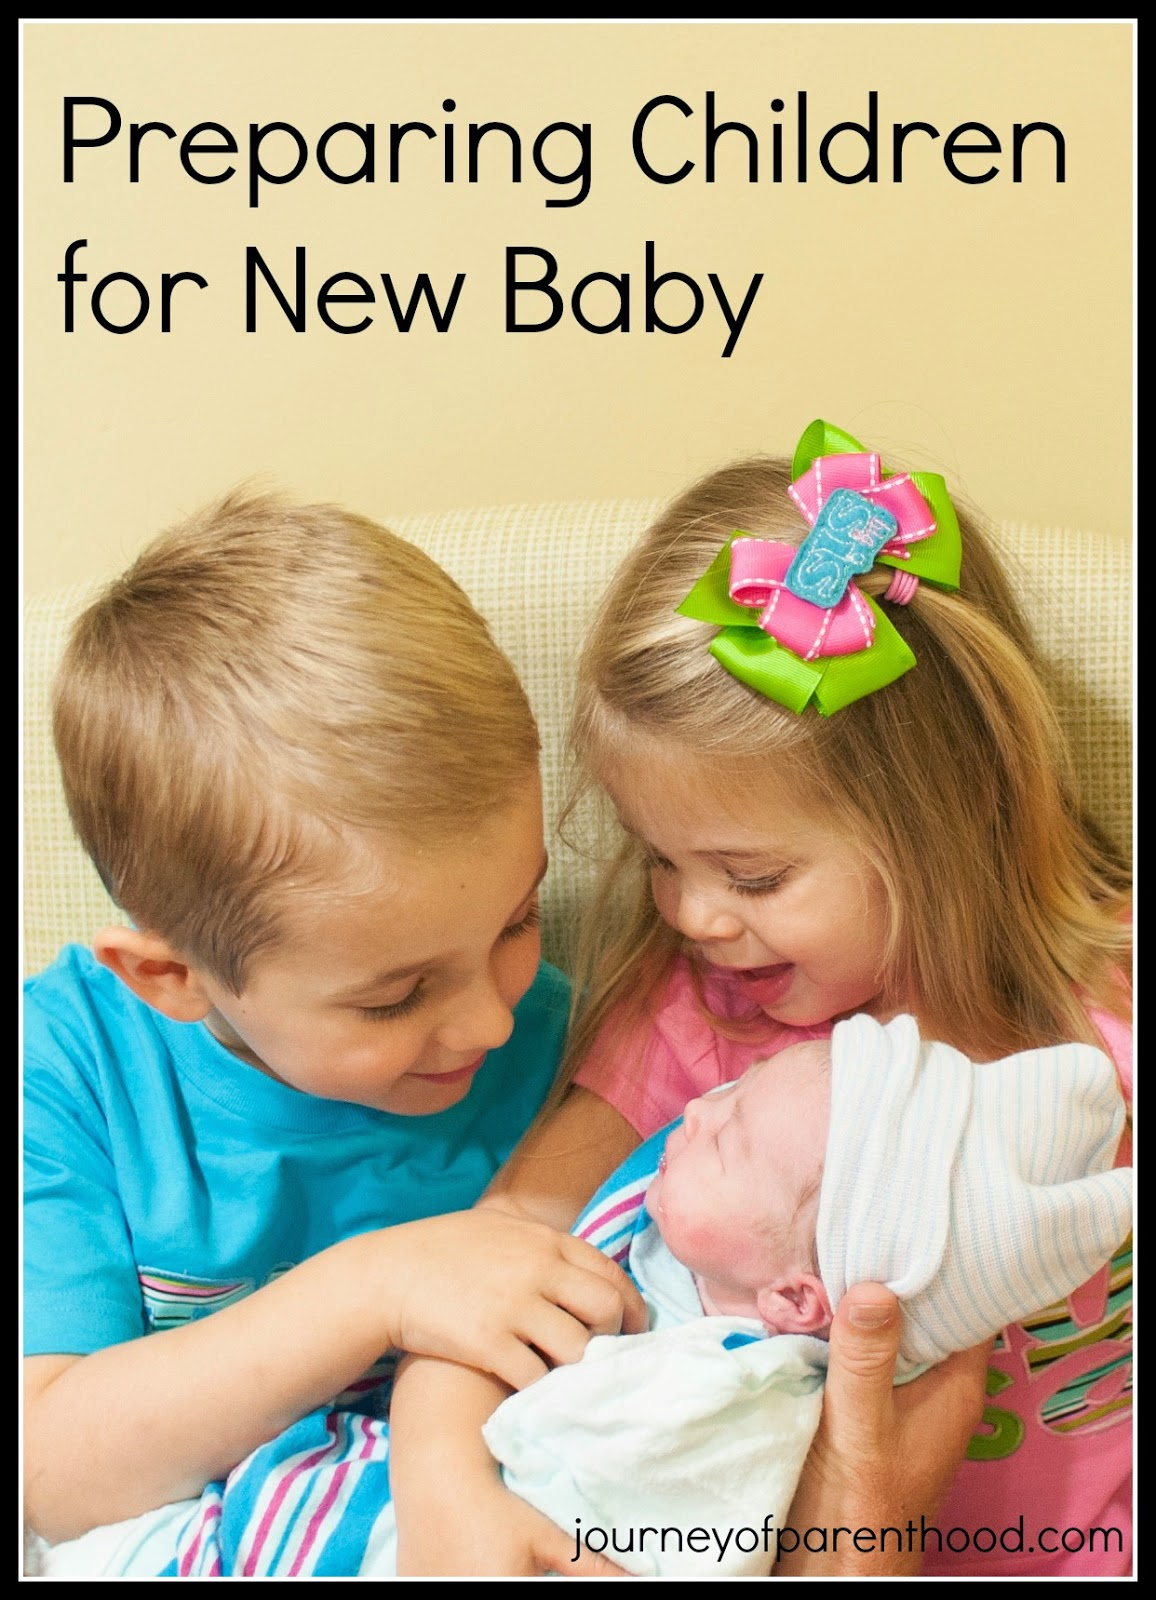 Preparing Children for New Baby